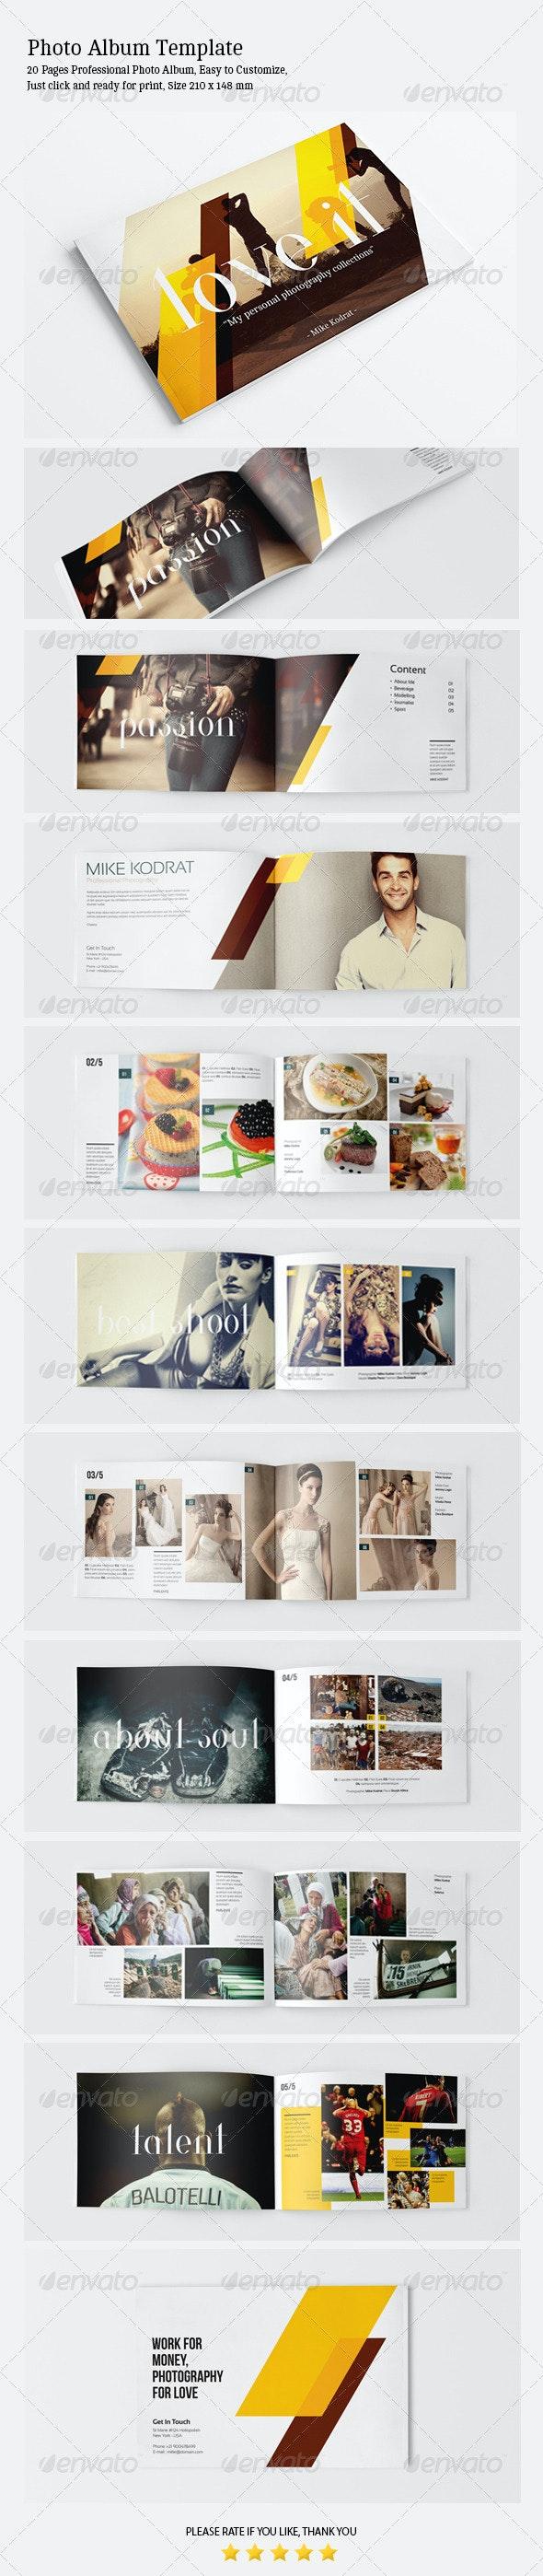 Photo Album Template - Photo Albums Print Templates